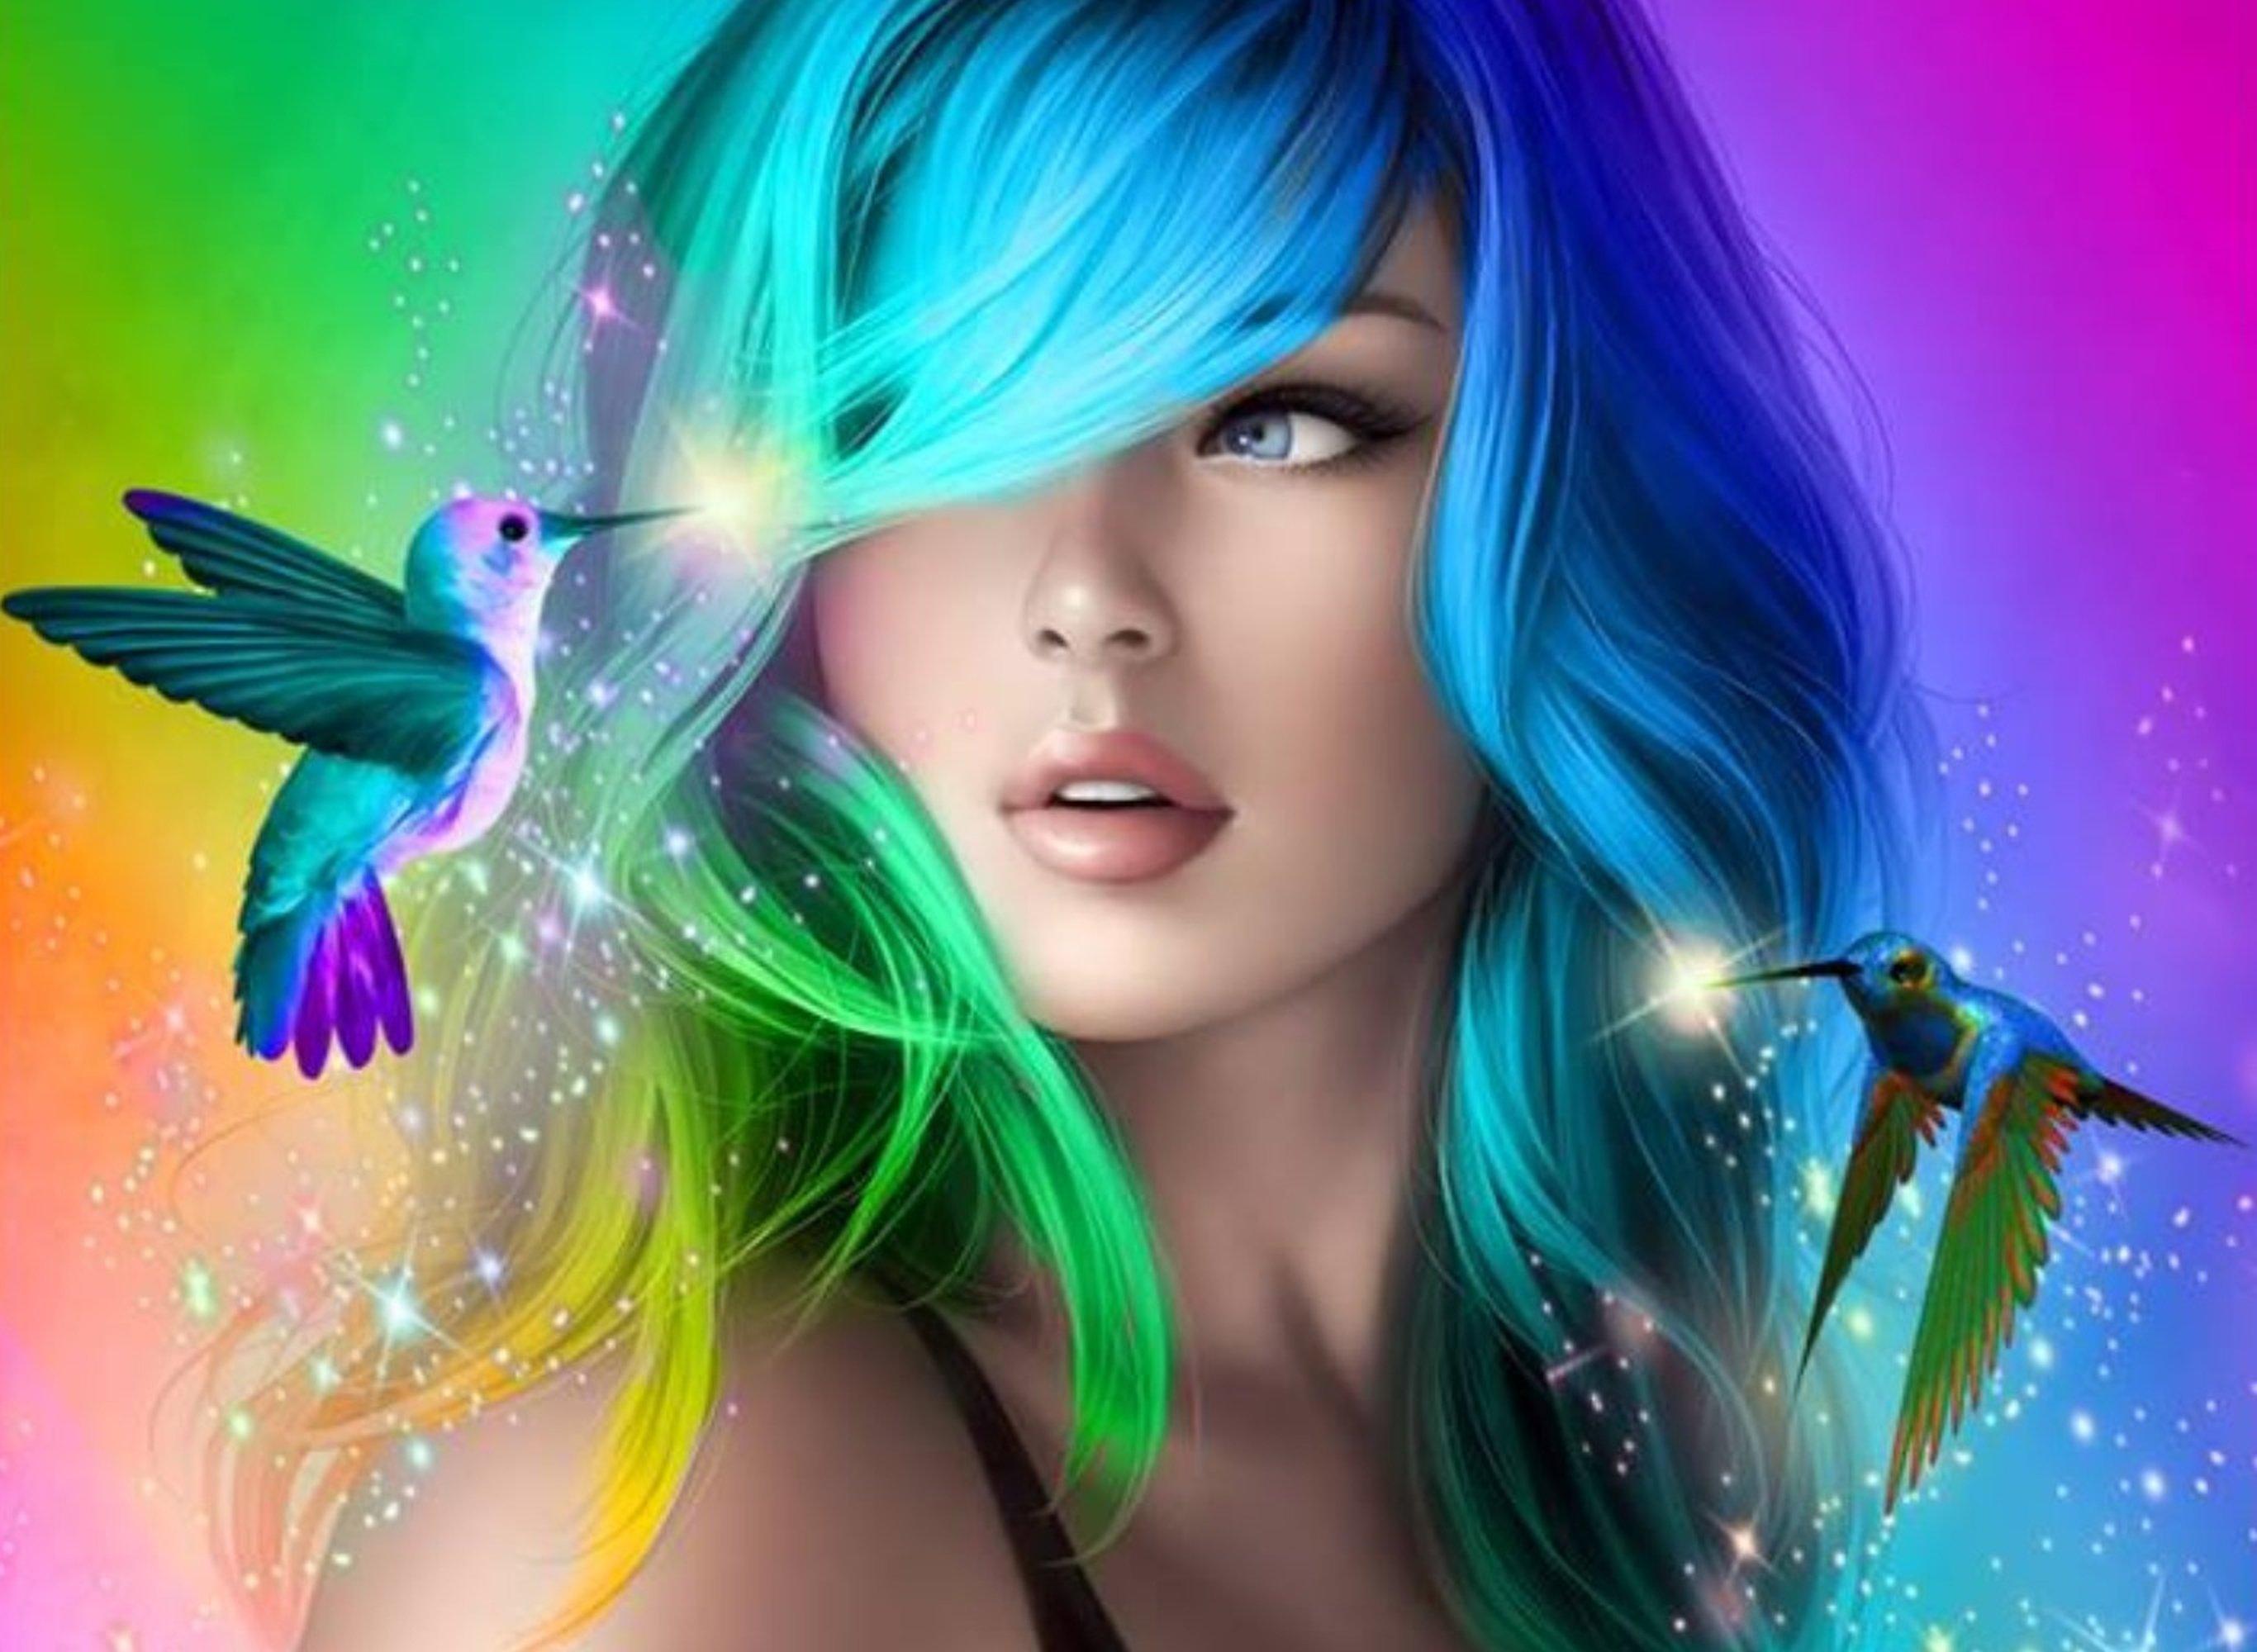 Fantasy Girl Desktop Wallpapers, Fantasy Girl Wallpaper | 29 HD